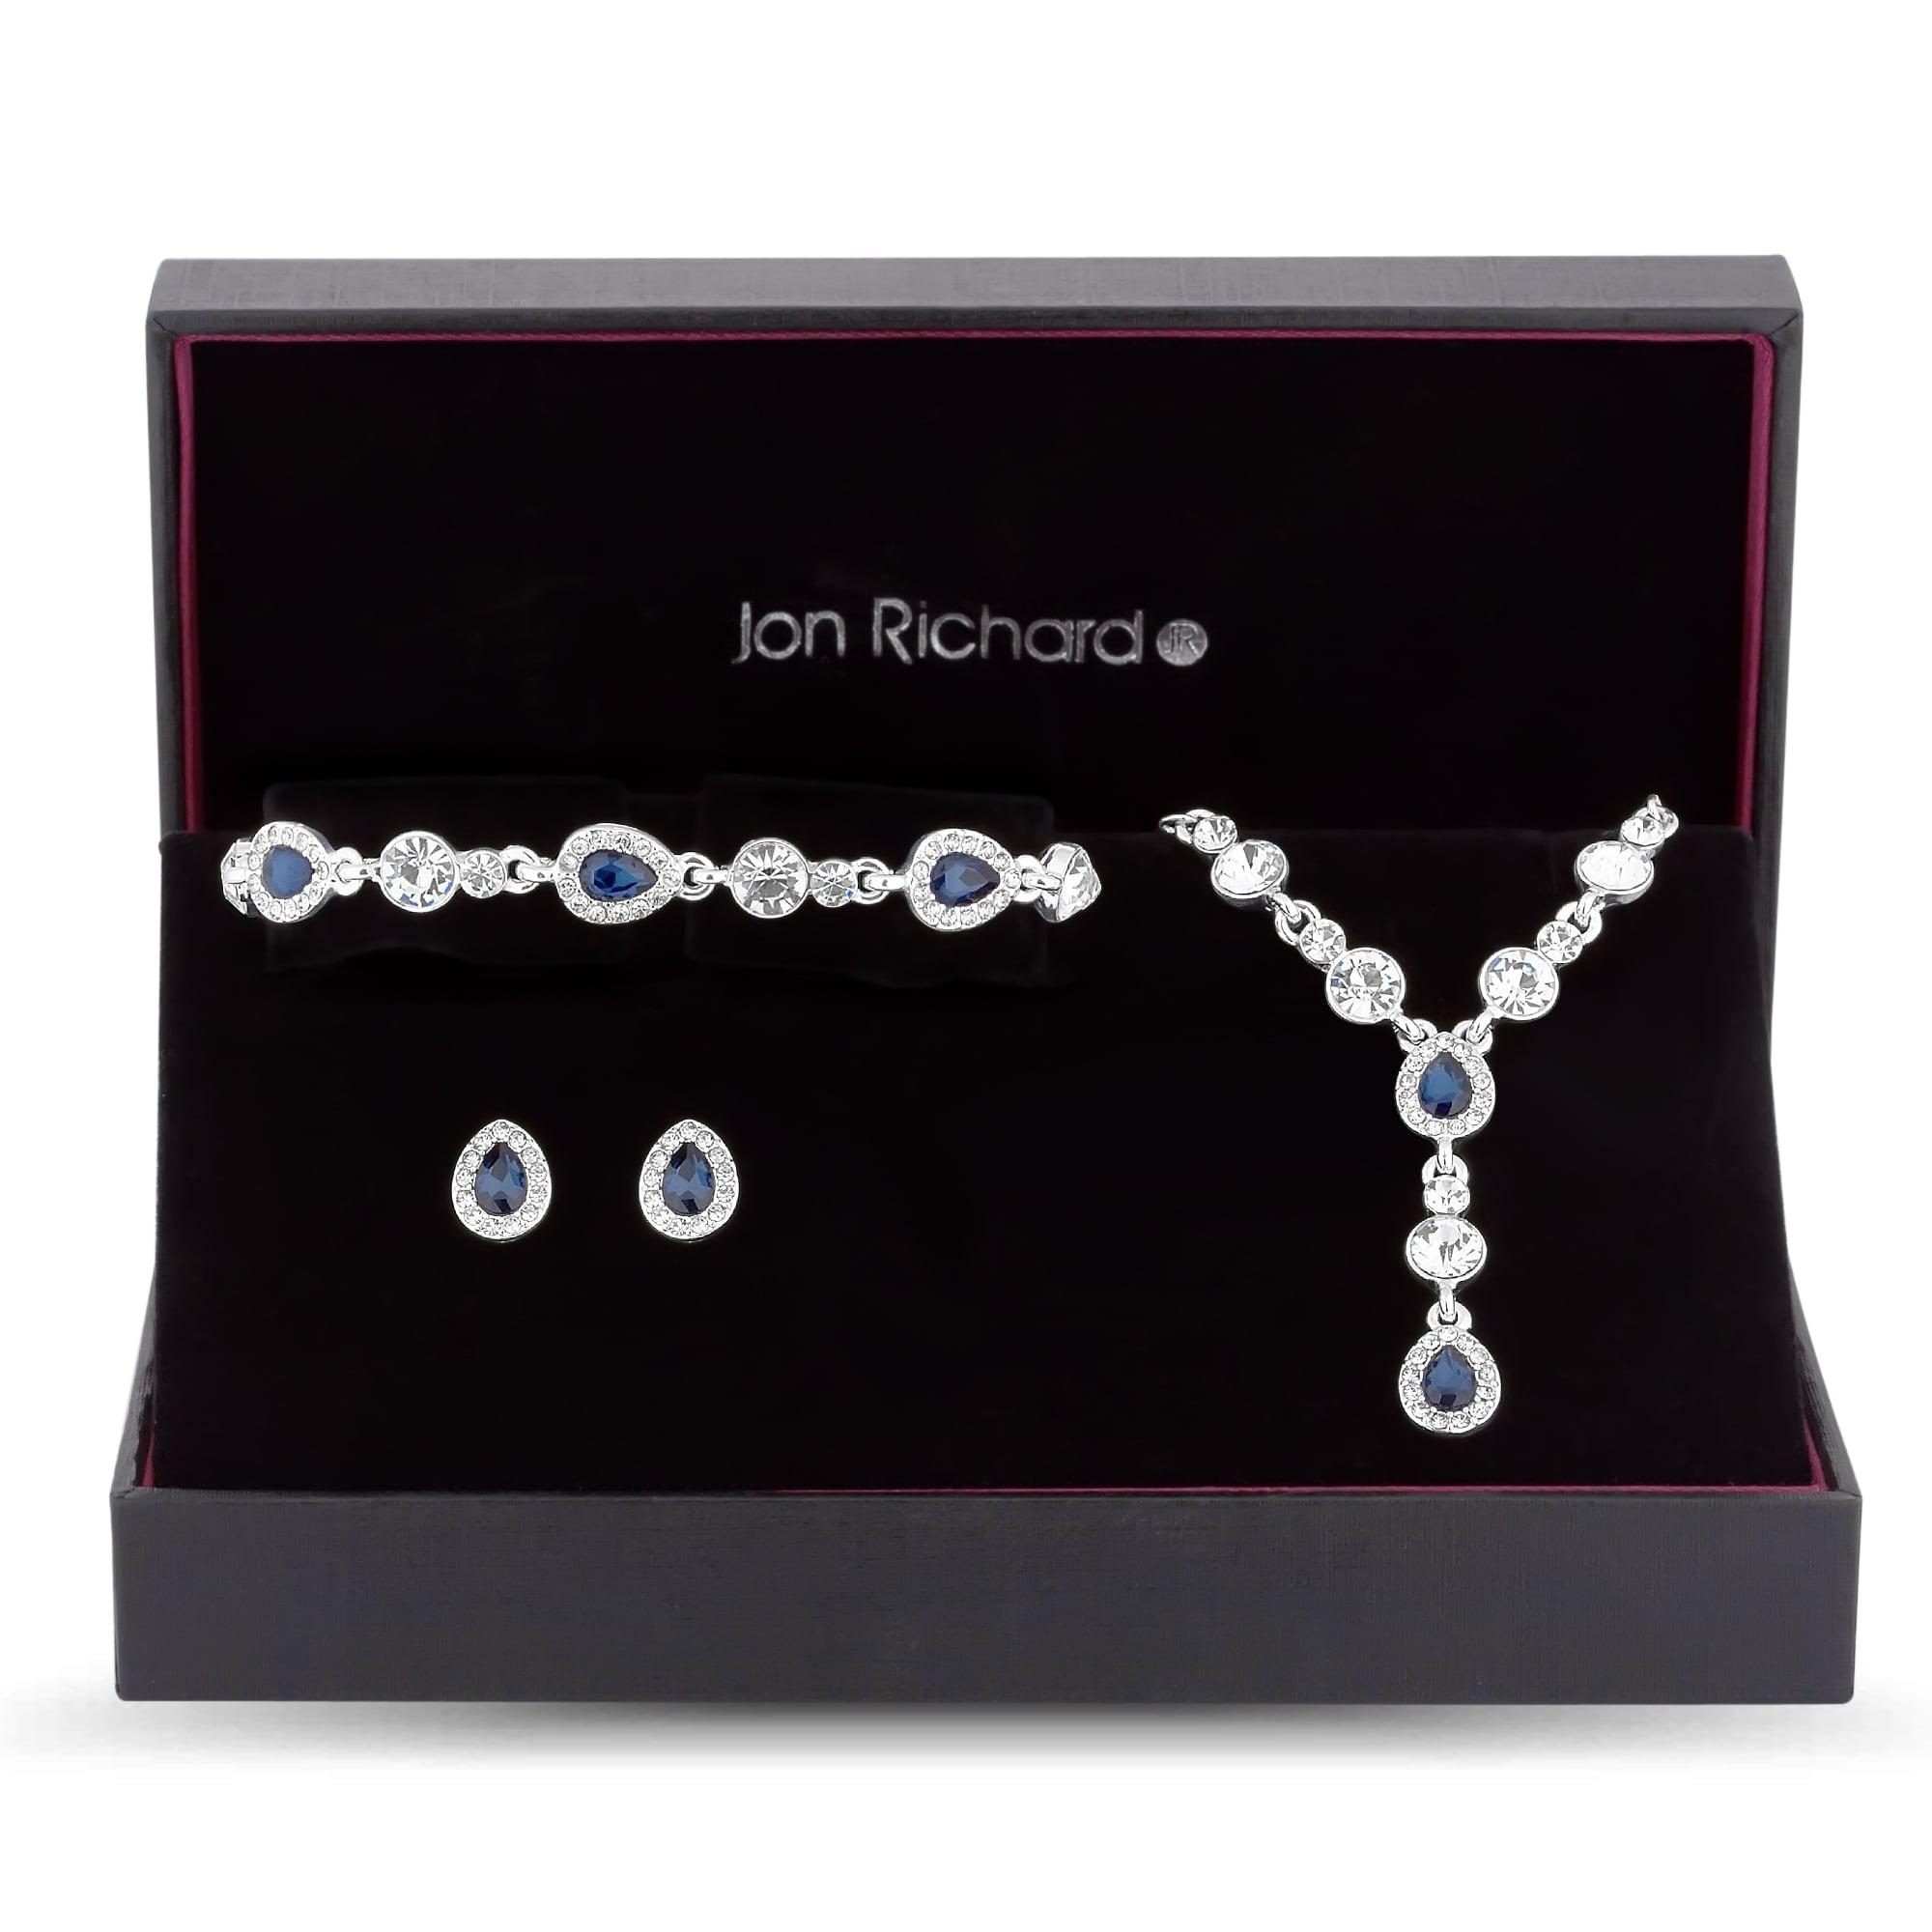 Debenhams Wedding Service Gift List Number: Jon Richard Silver Plated Blue Crystal Peardrop Jewellery